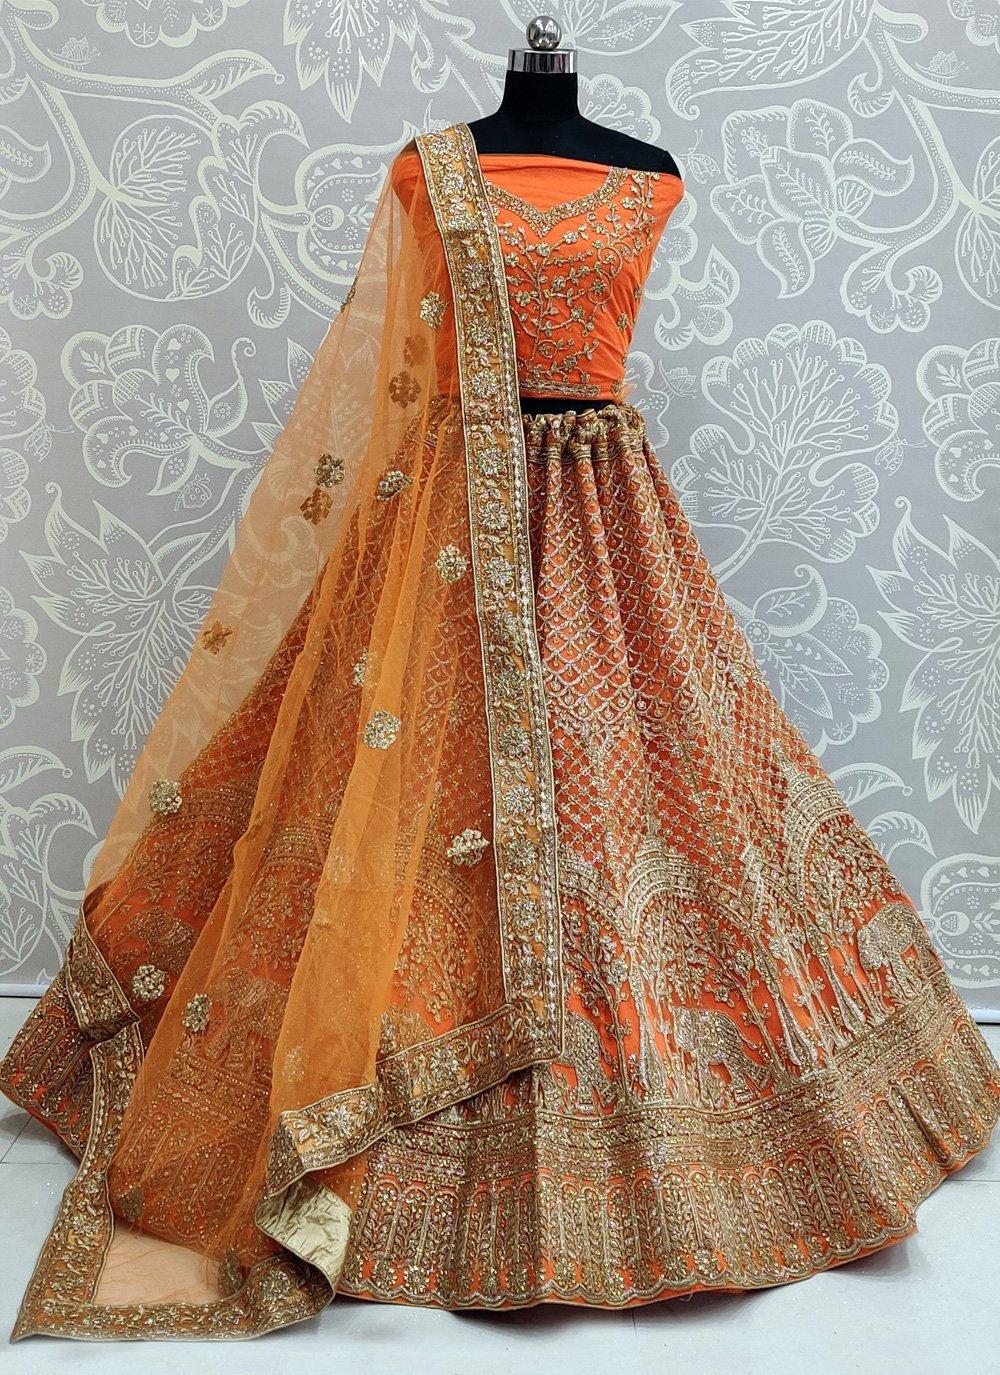 Dimond Net Trendy Lehenga Choli